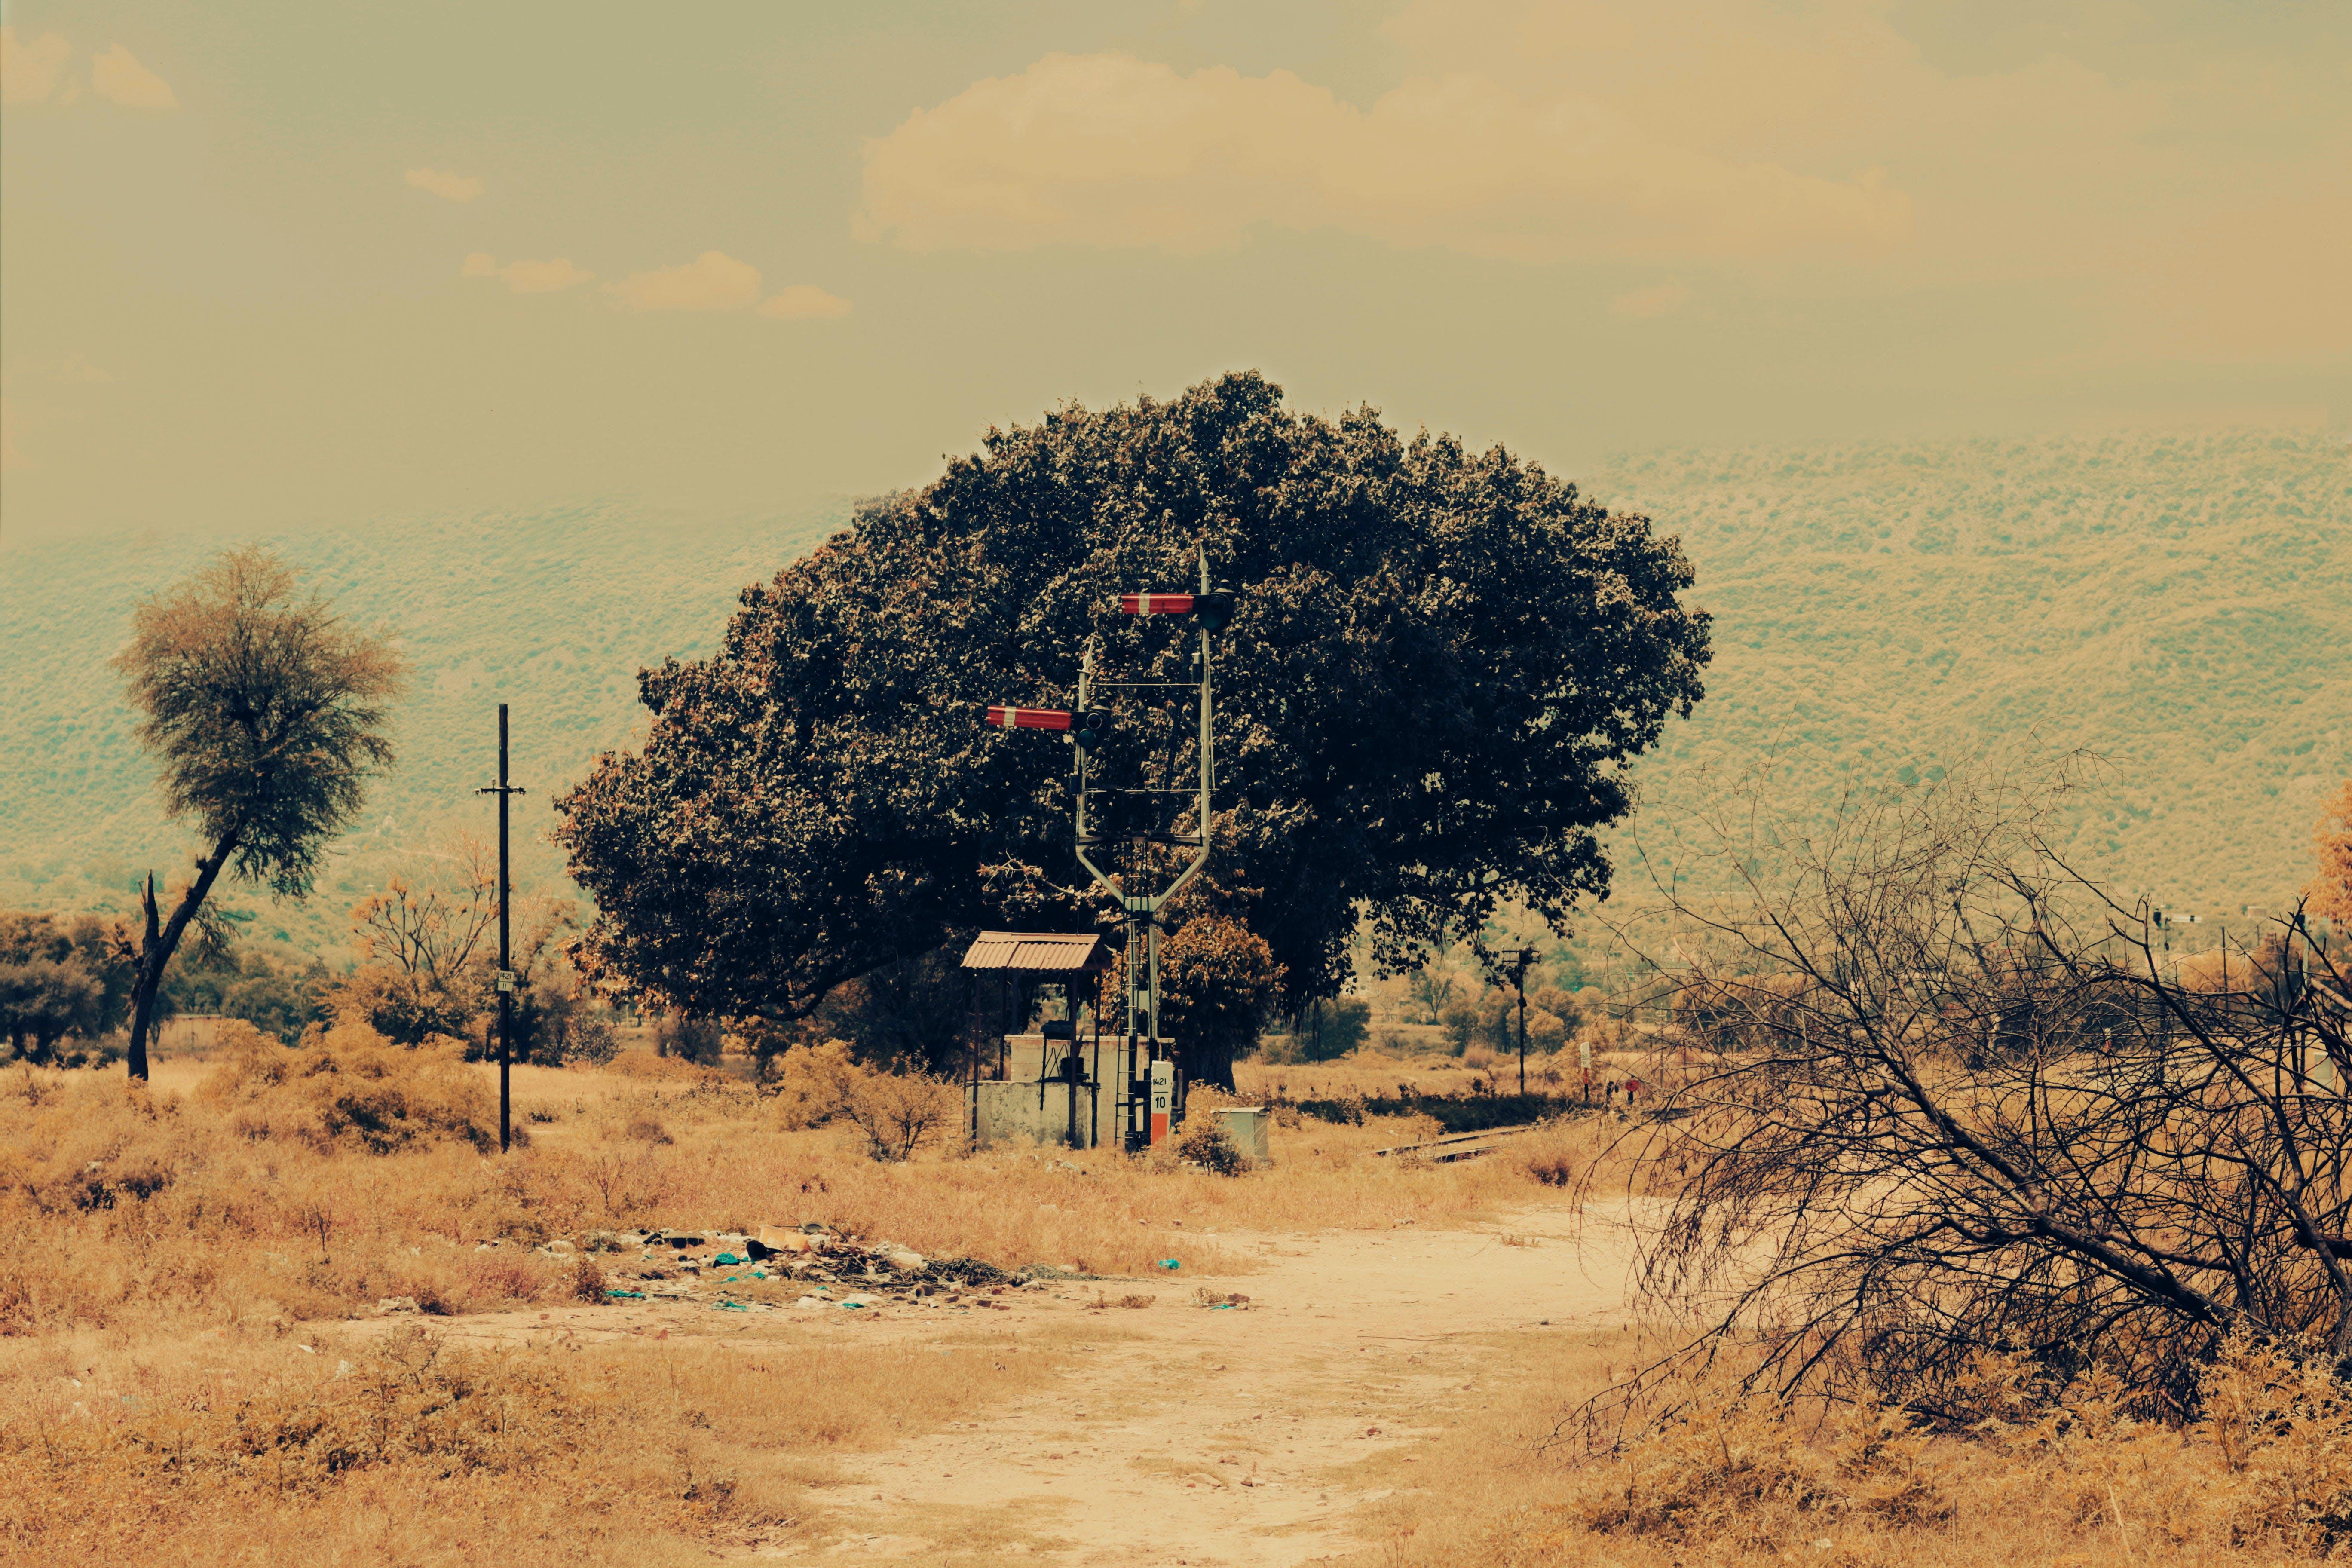 Free stock photo of kg pro films, kgprofilms, pakistani railway signals, pakistani railway track signals